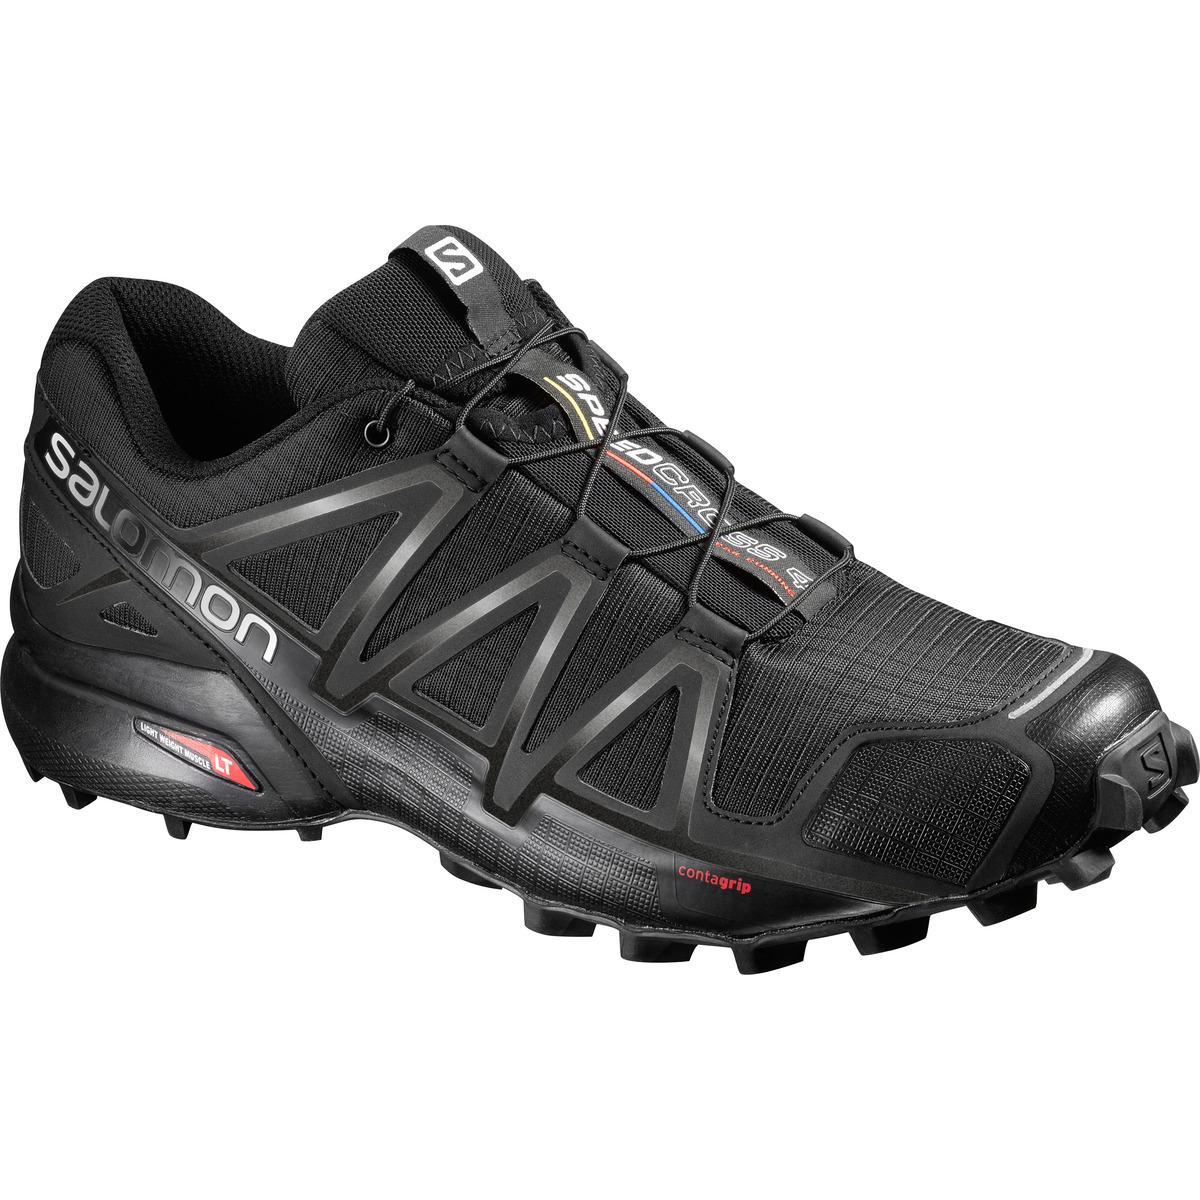 Zapatillas de trail running de hombre Speedcross 4 Salomon